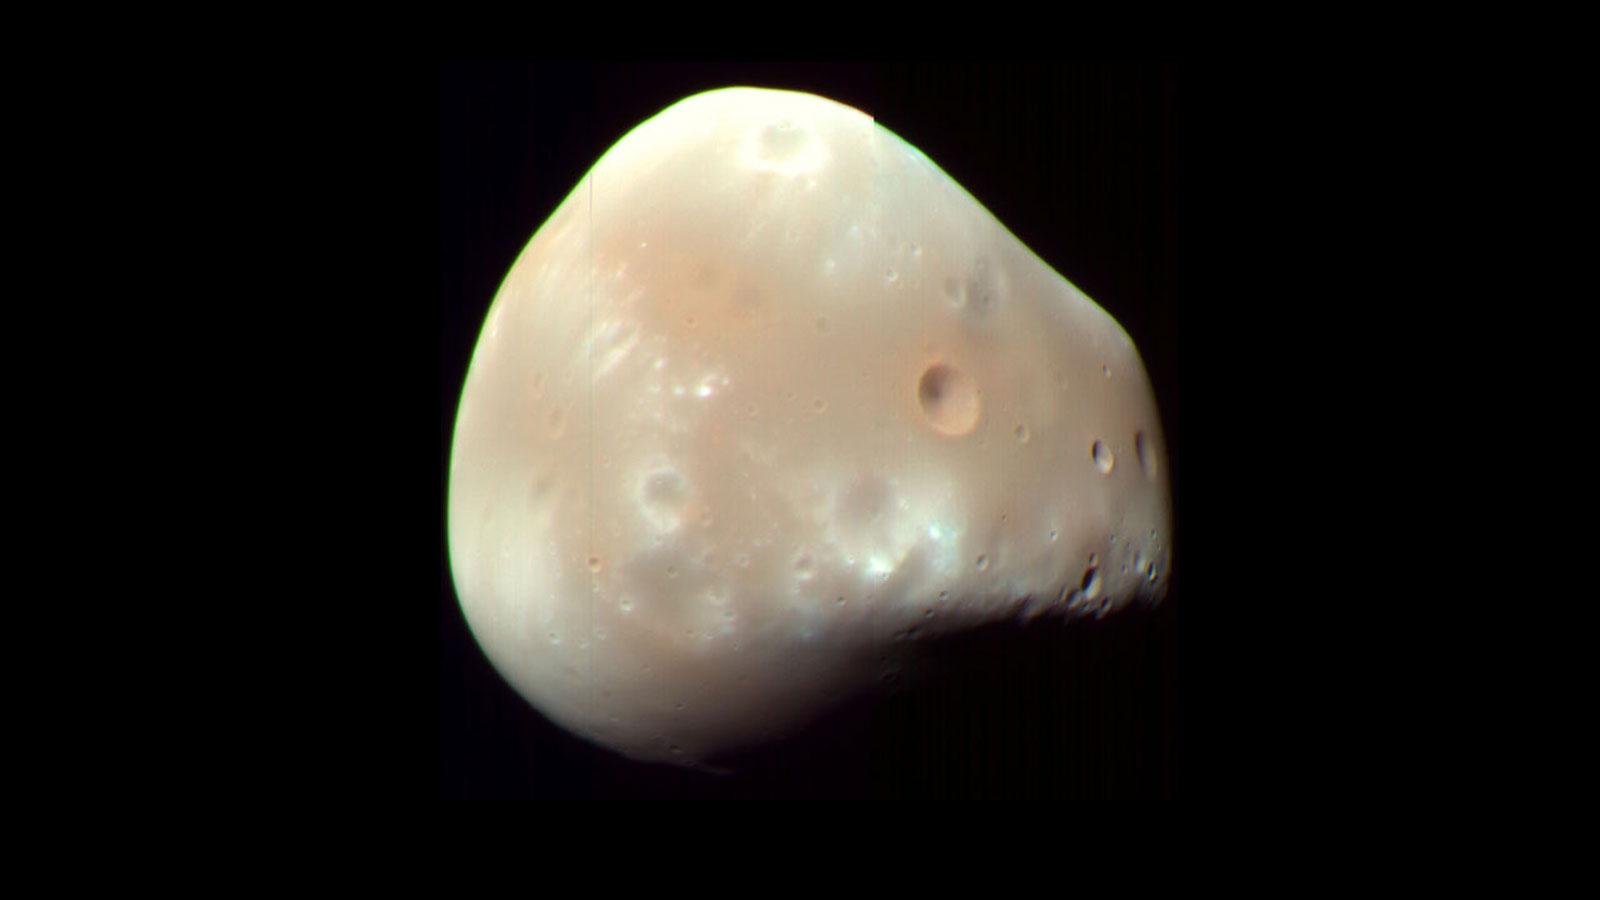 Deimos Facts - Mar's Moon